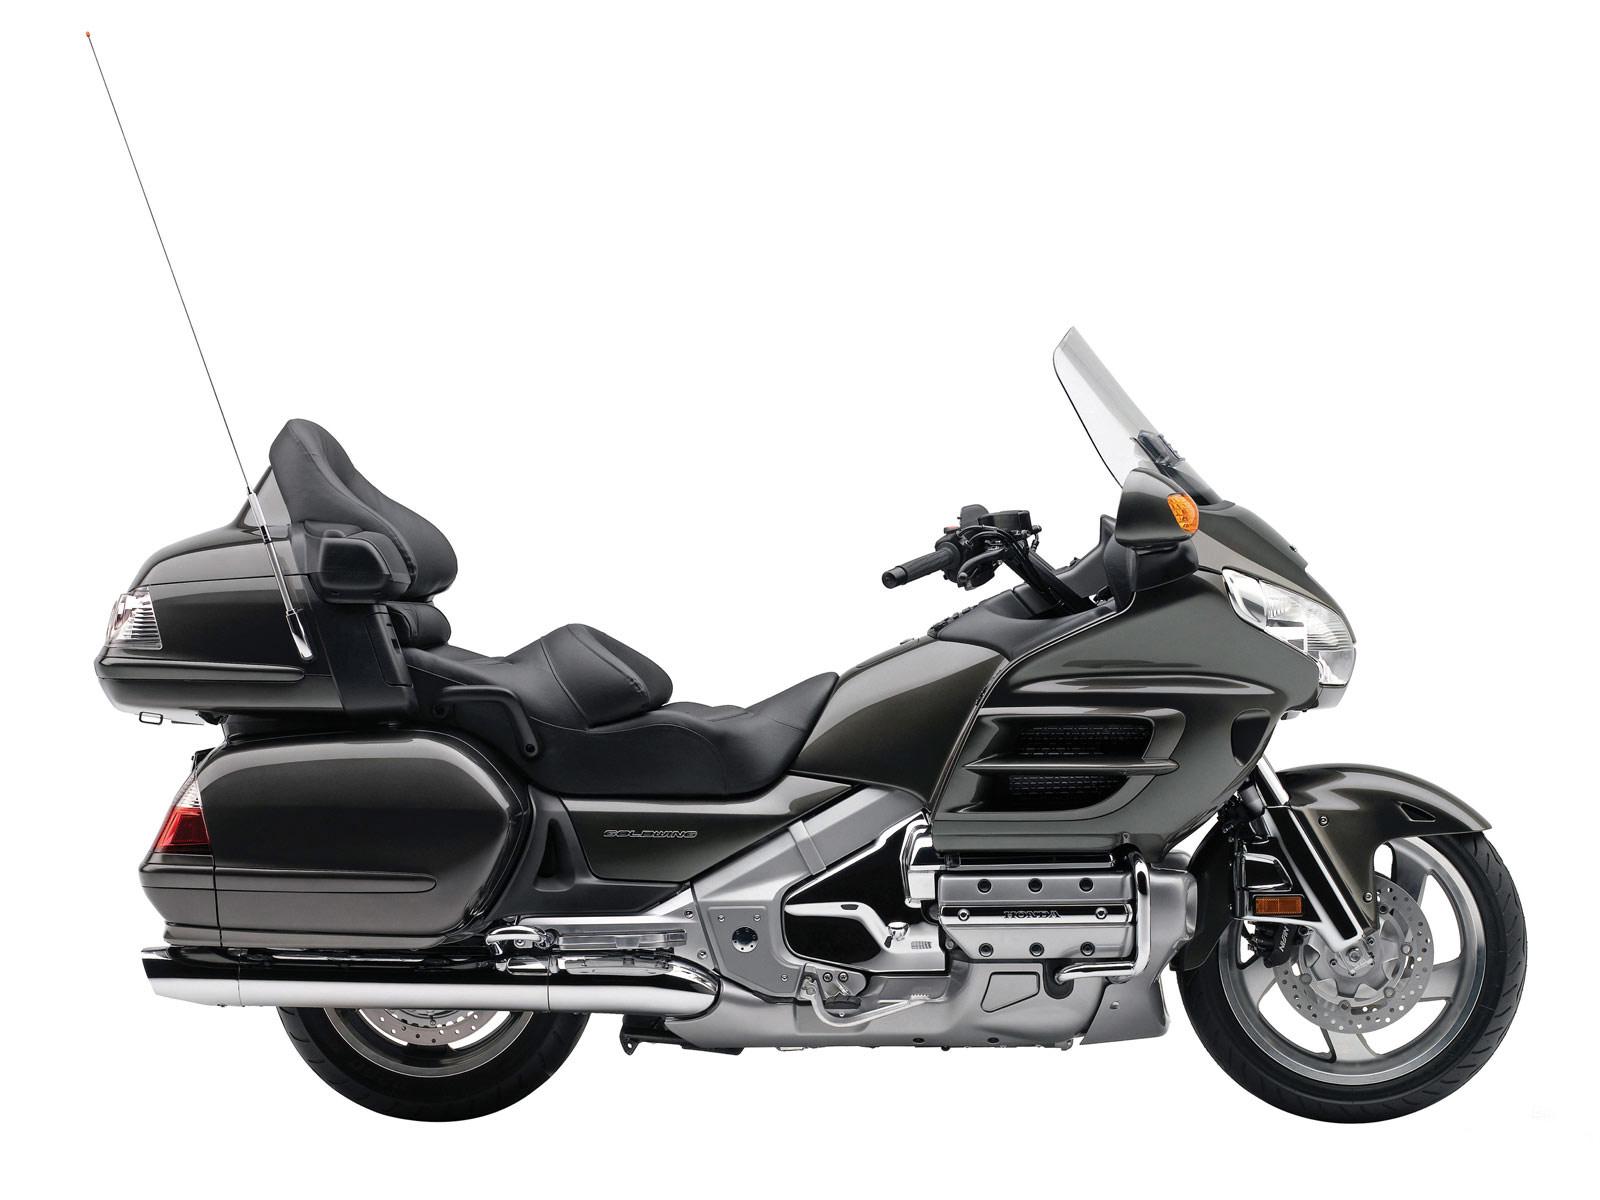 2010 honda gold wing motorcycle insurance wallpaper specs. Black Bedroom Furniture Sets. Home Design Ideas